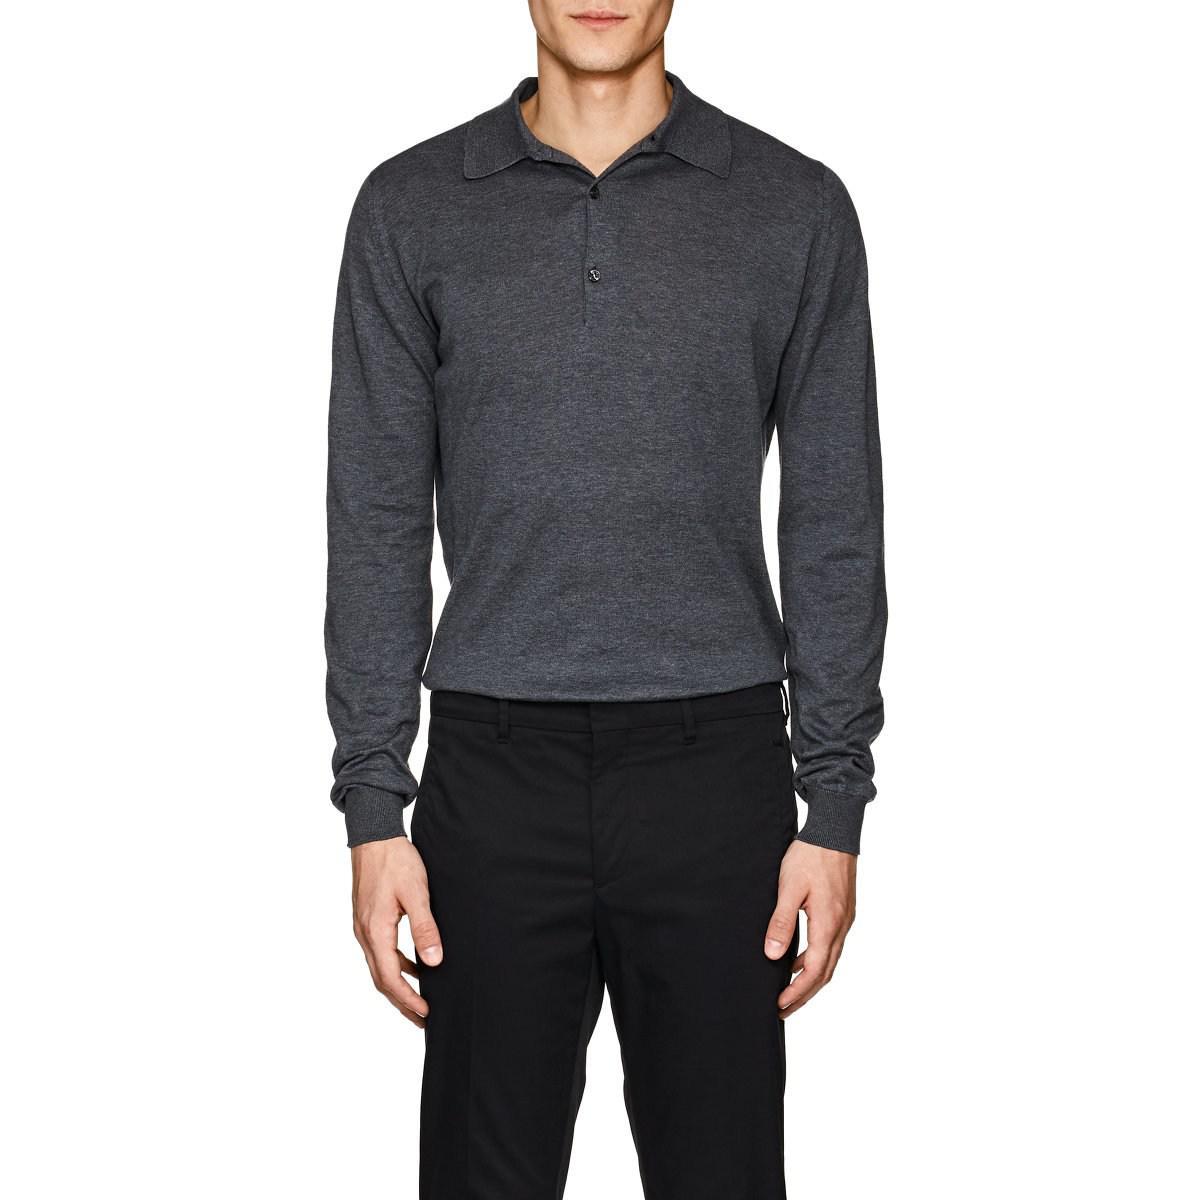 ce238431 John Smedley Bradwell Cotton Polo Shirt in Gray for Men - Lyst